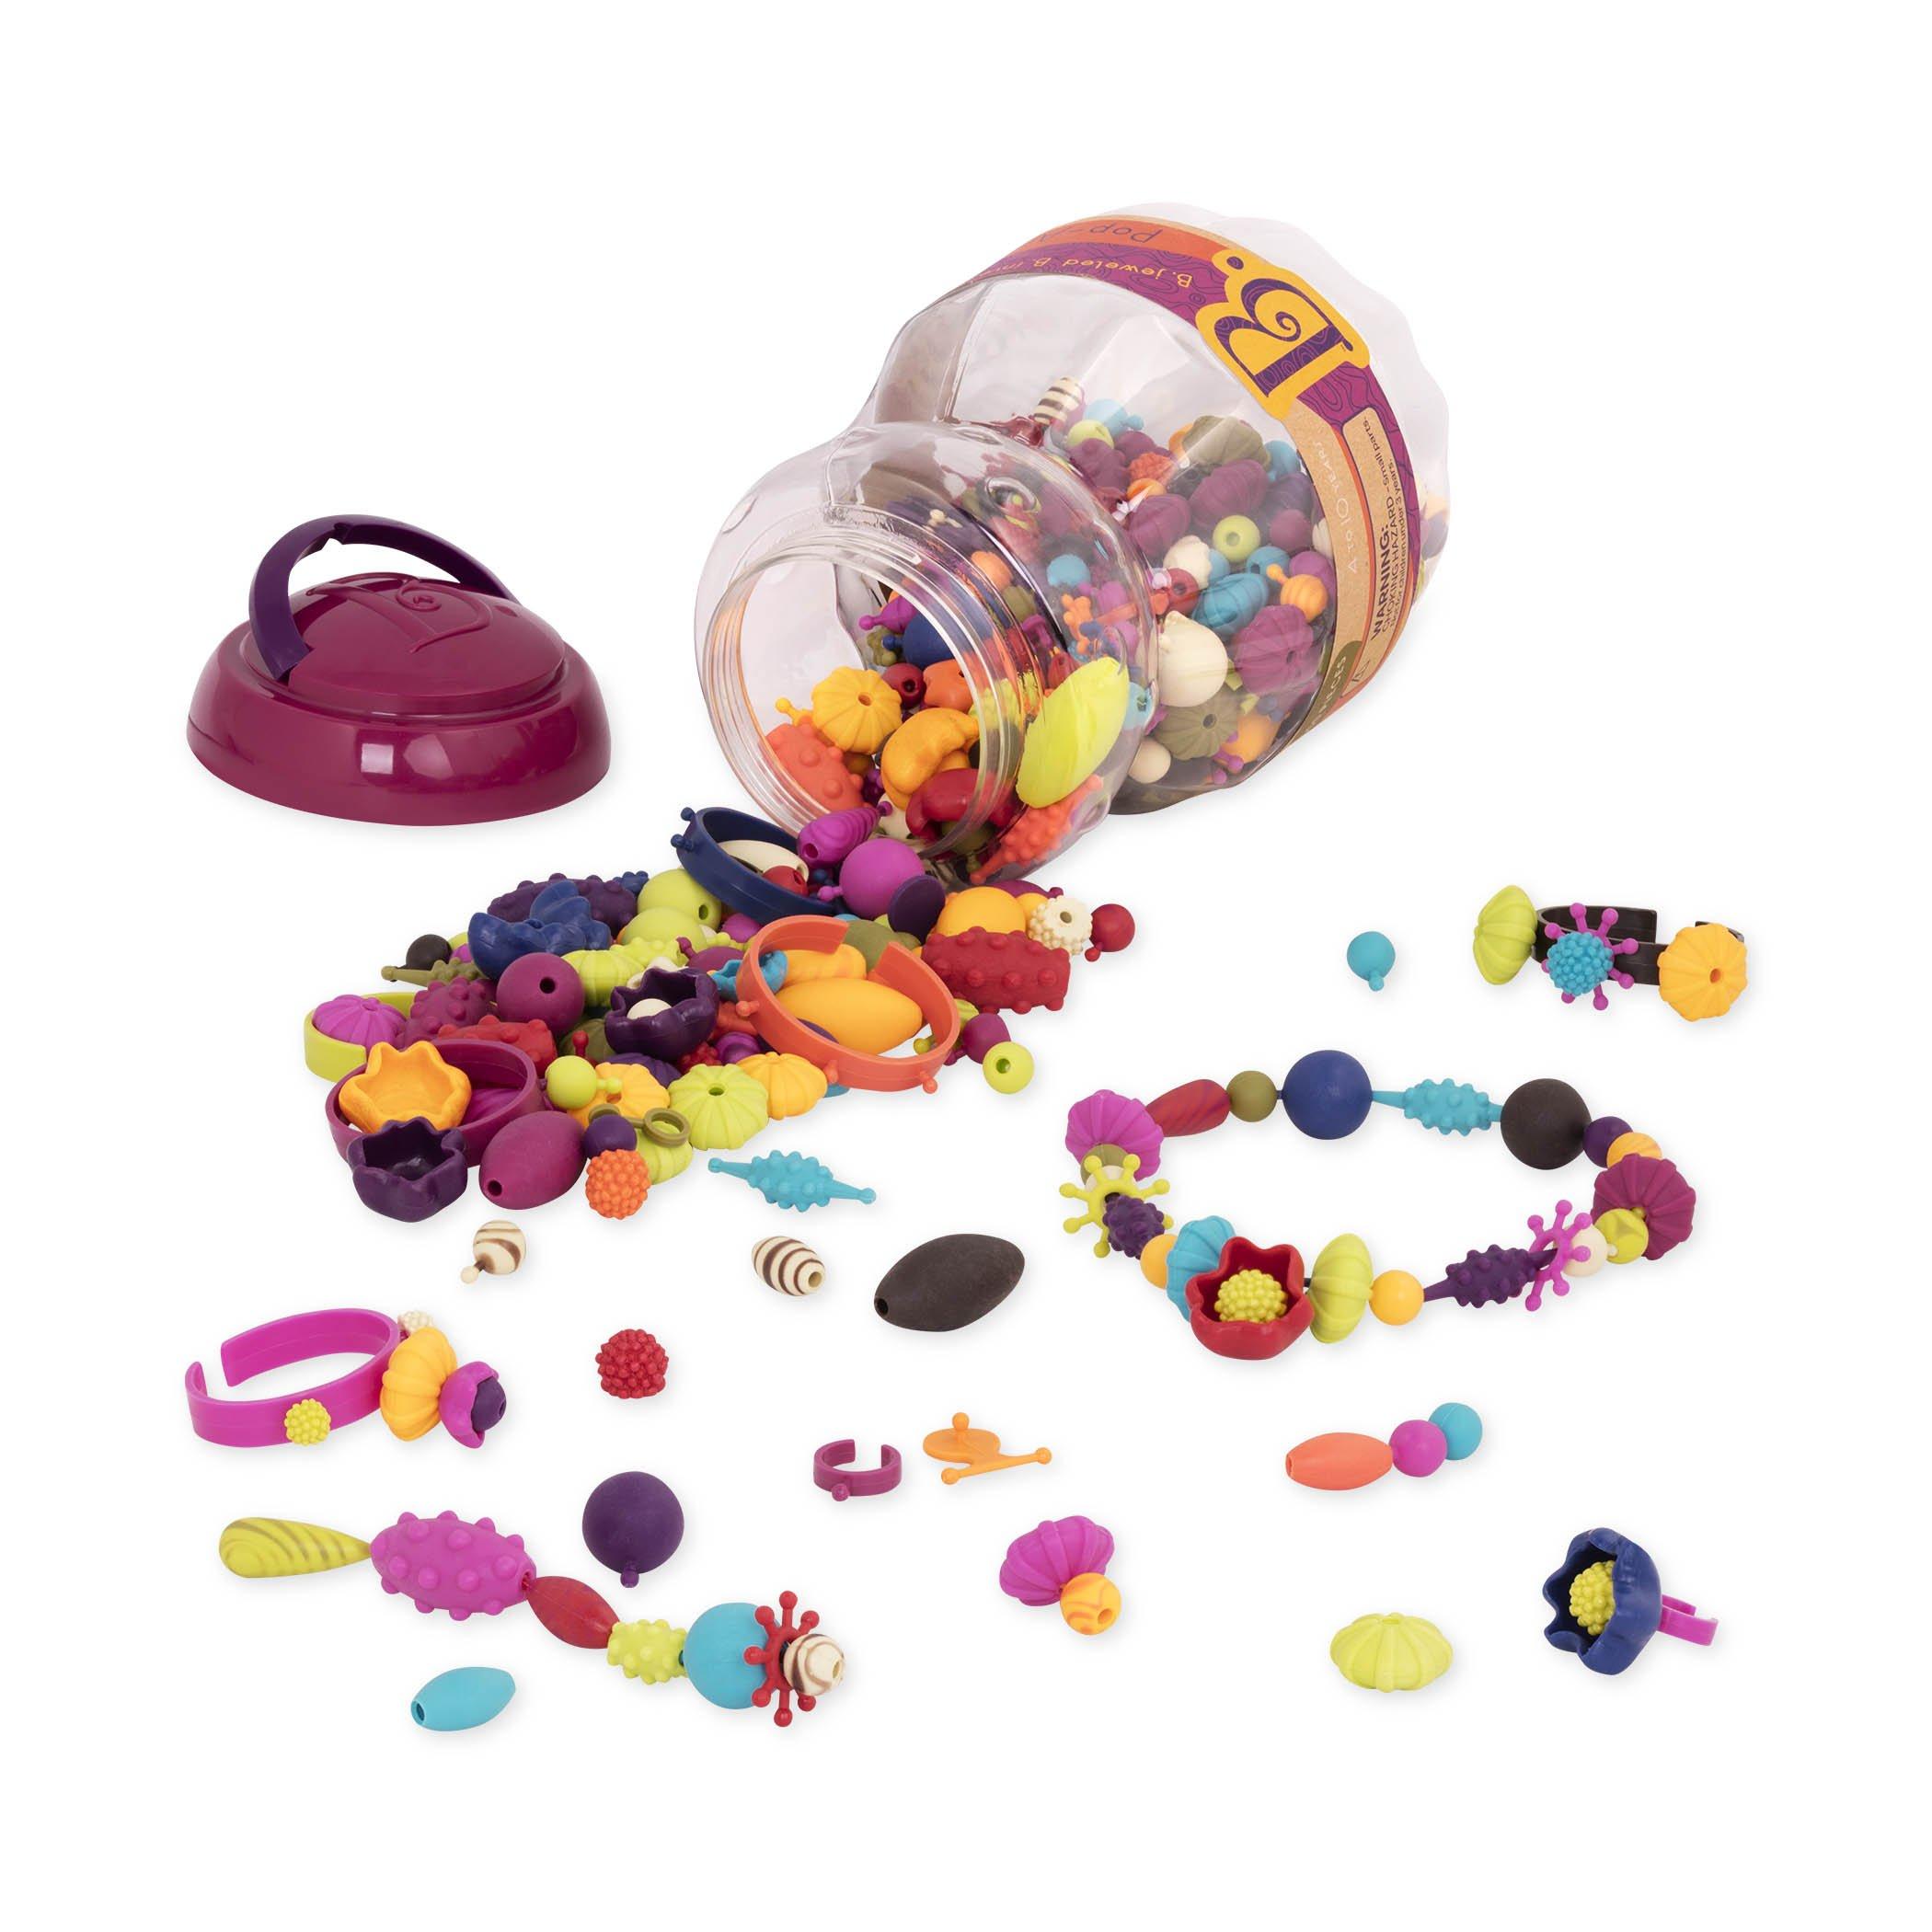 B Toys - (500-Pcs) Pop Snap Bead Jewelry - DIY Jewelry Kit for Kids by B. toys by Battat